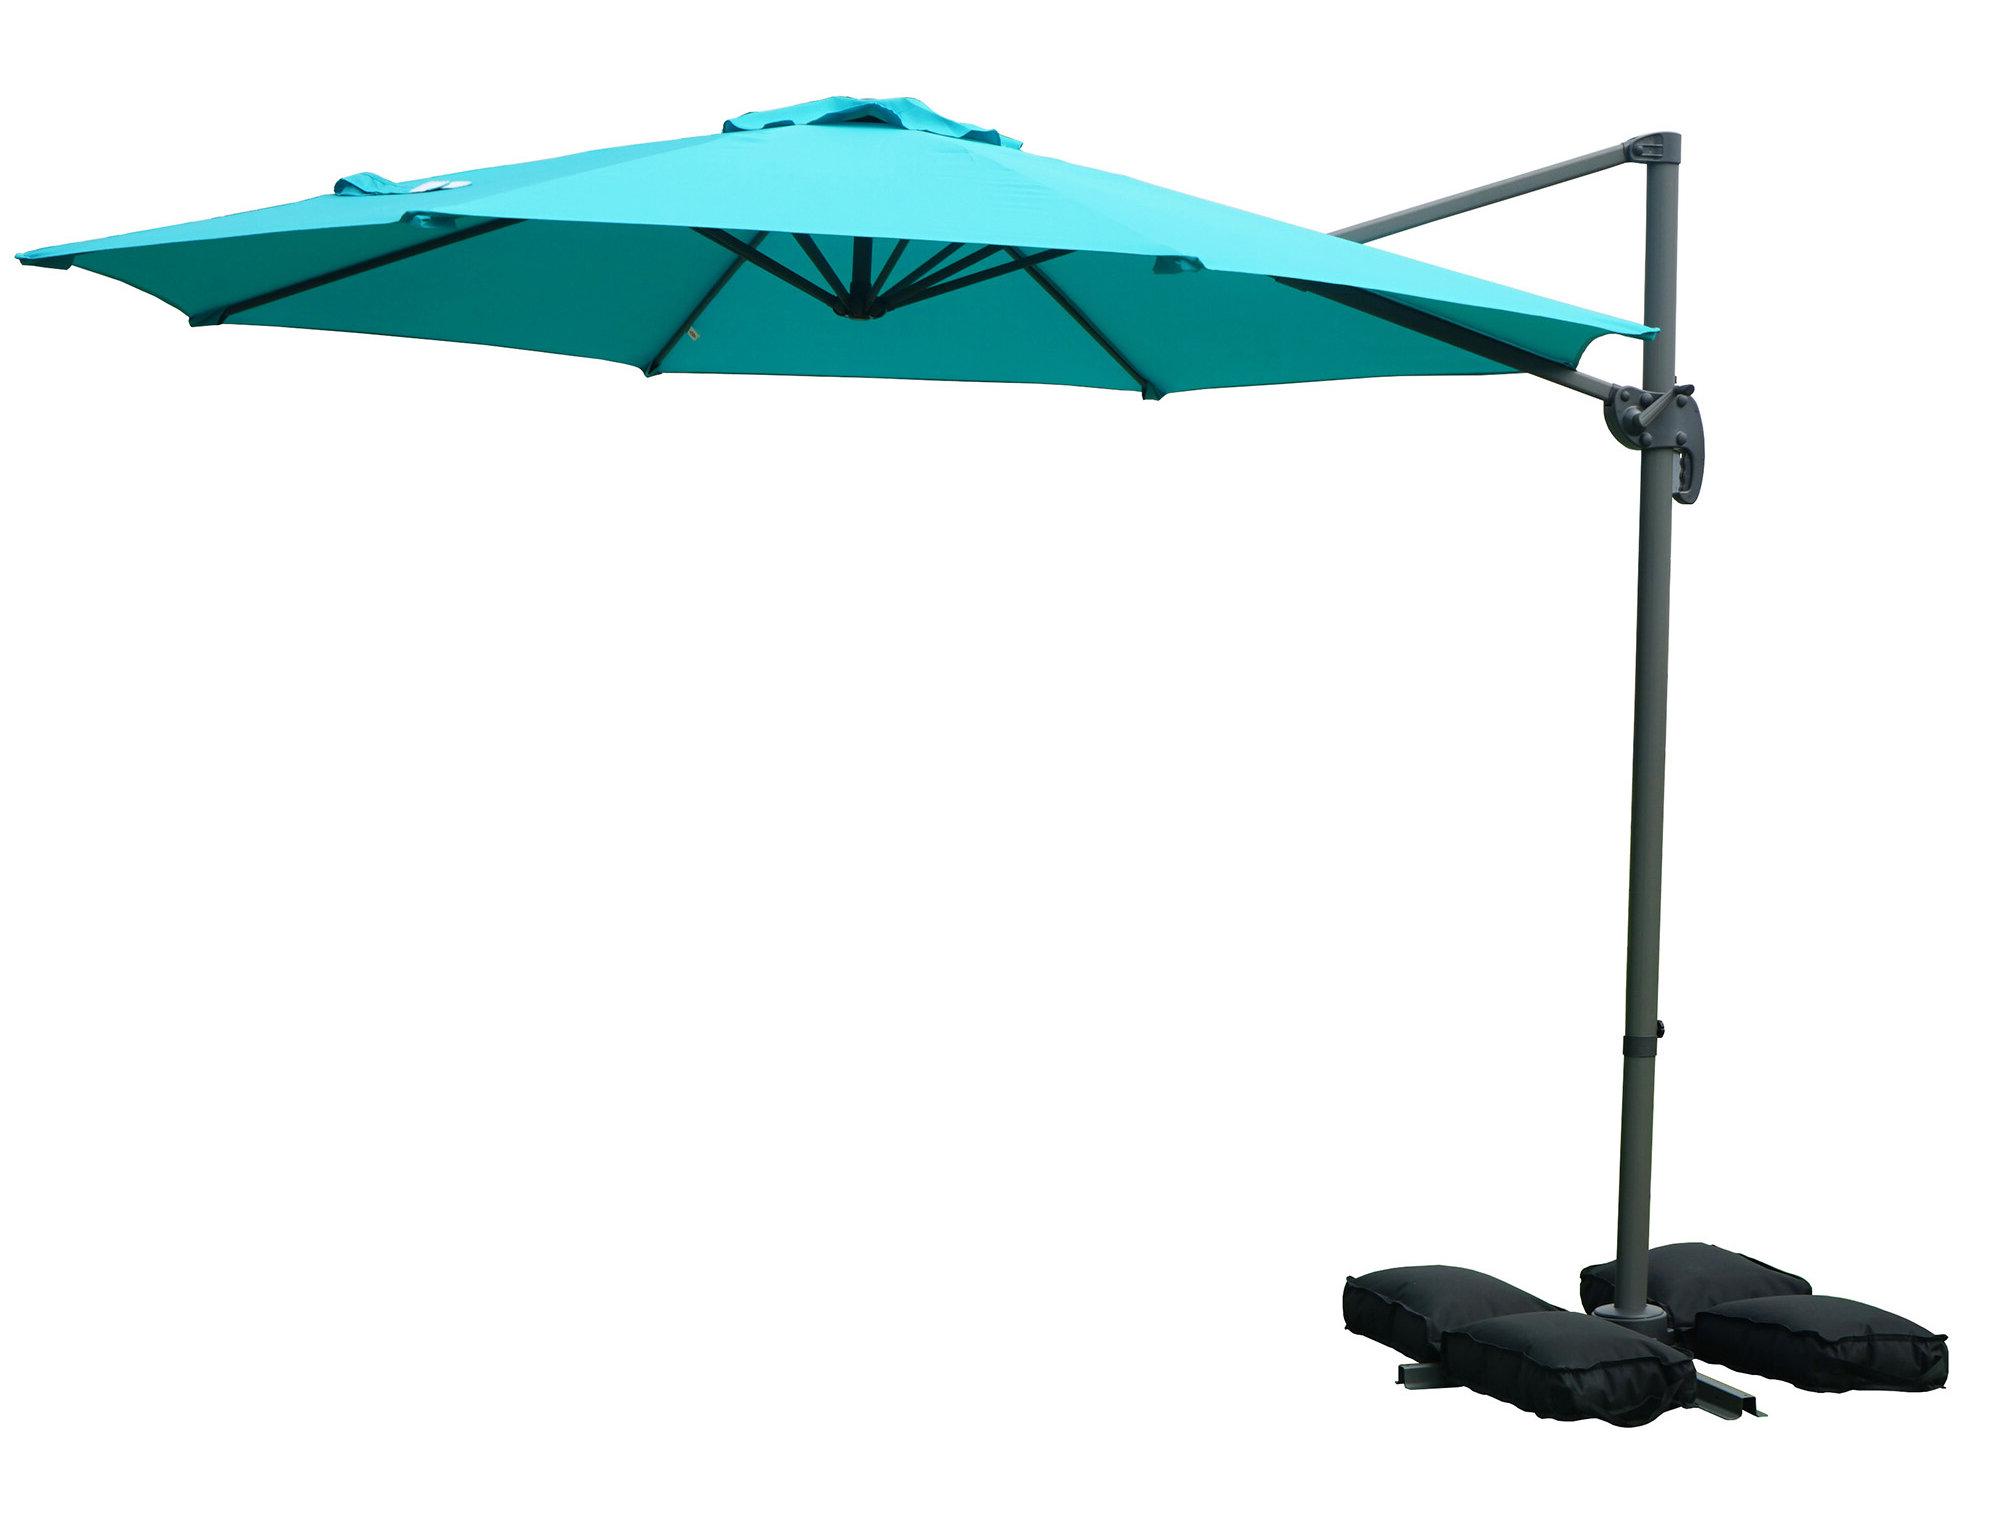 Muhammad Fullerton Cantilever Umbrellas Throughout Recent Tottenham Patio Hanging Offset 10' Cantilever Umbrella (View 17 of 20)